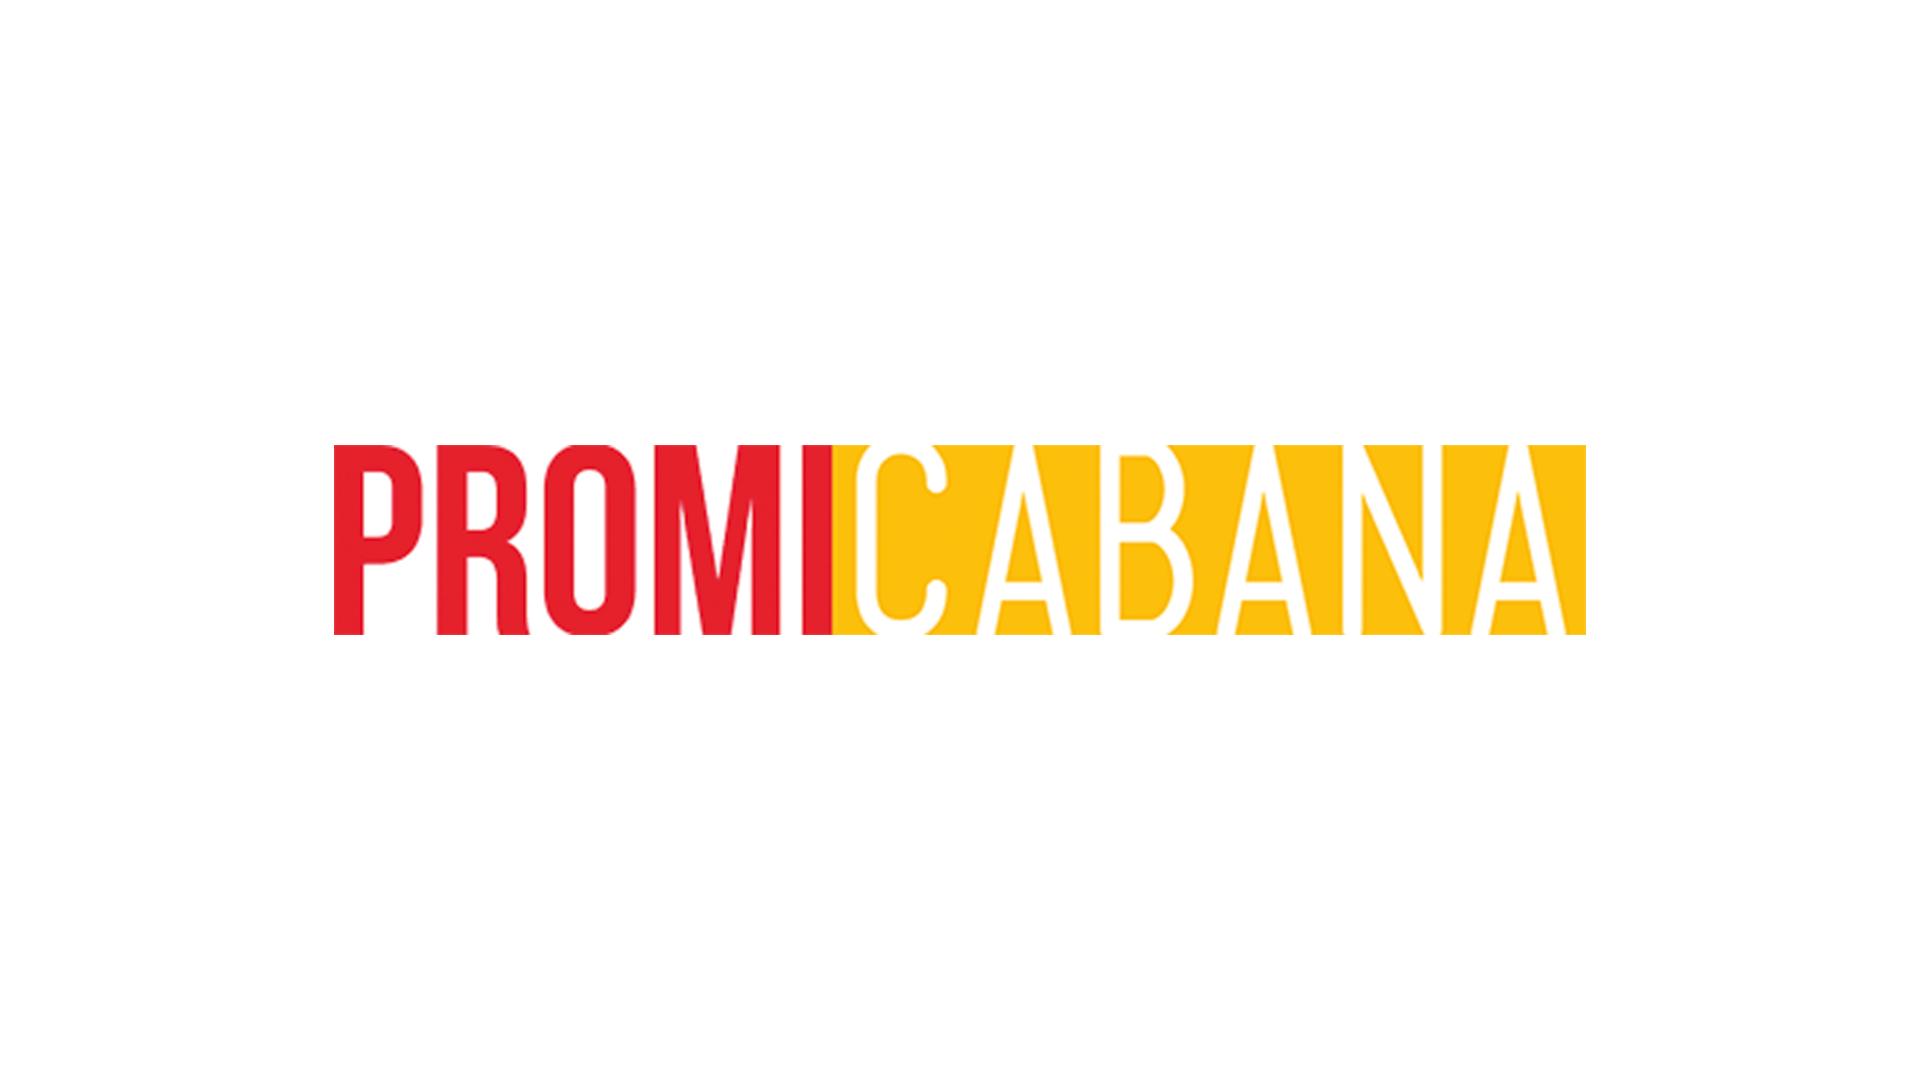 John-Wick-Kapitel-2-Trailer-Keanu-Reeves